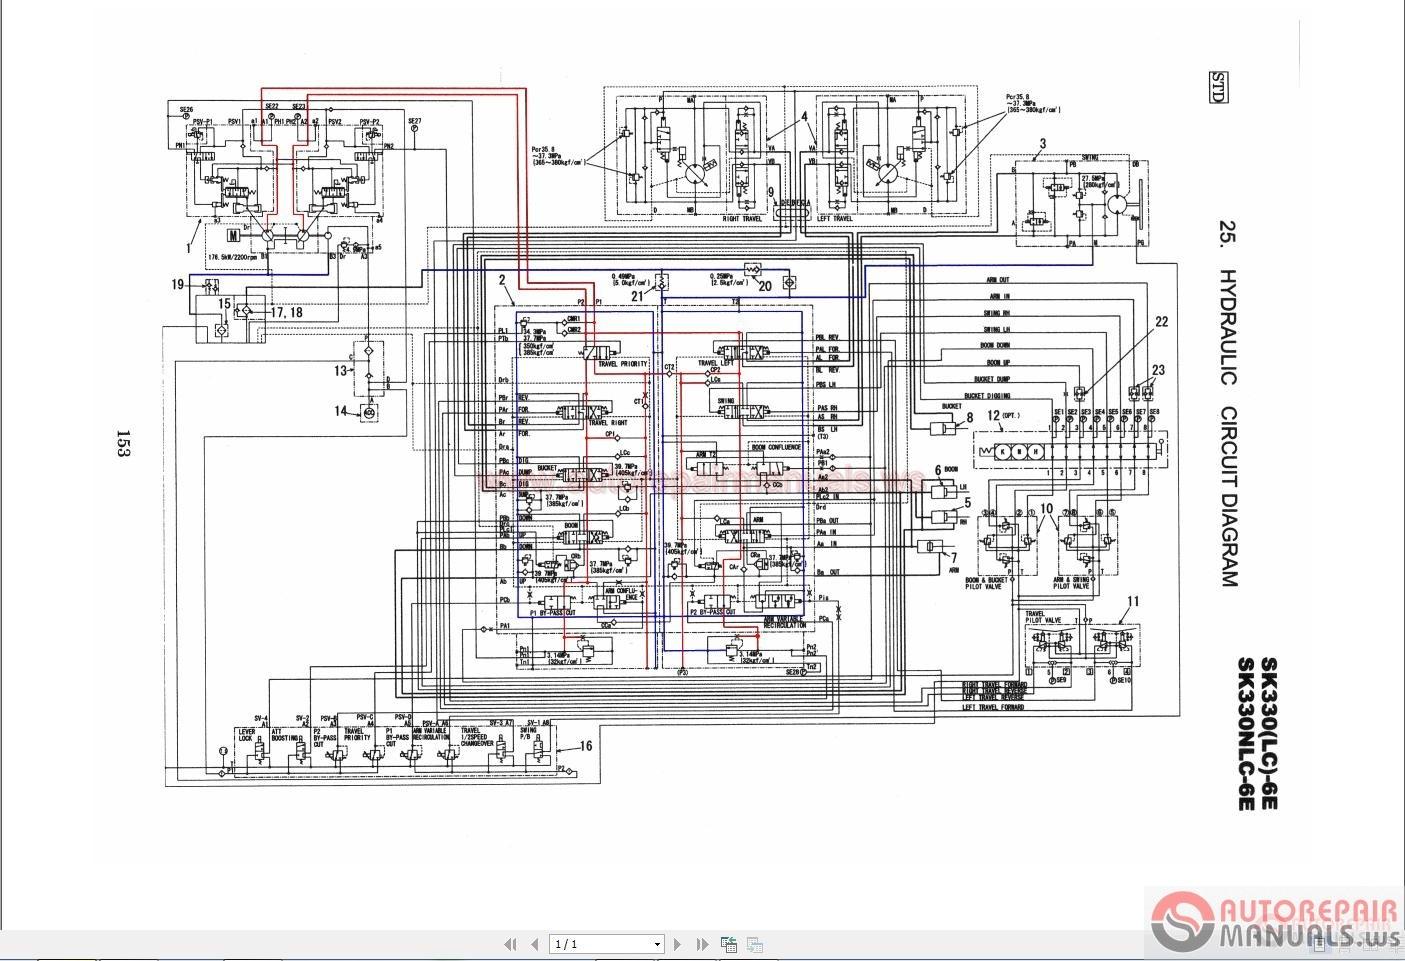 kobelco loader wiring diagram ingersoll rand wiring